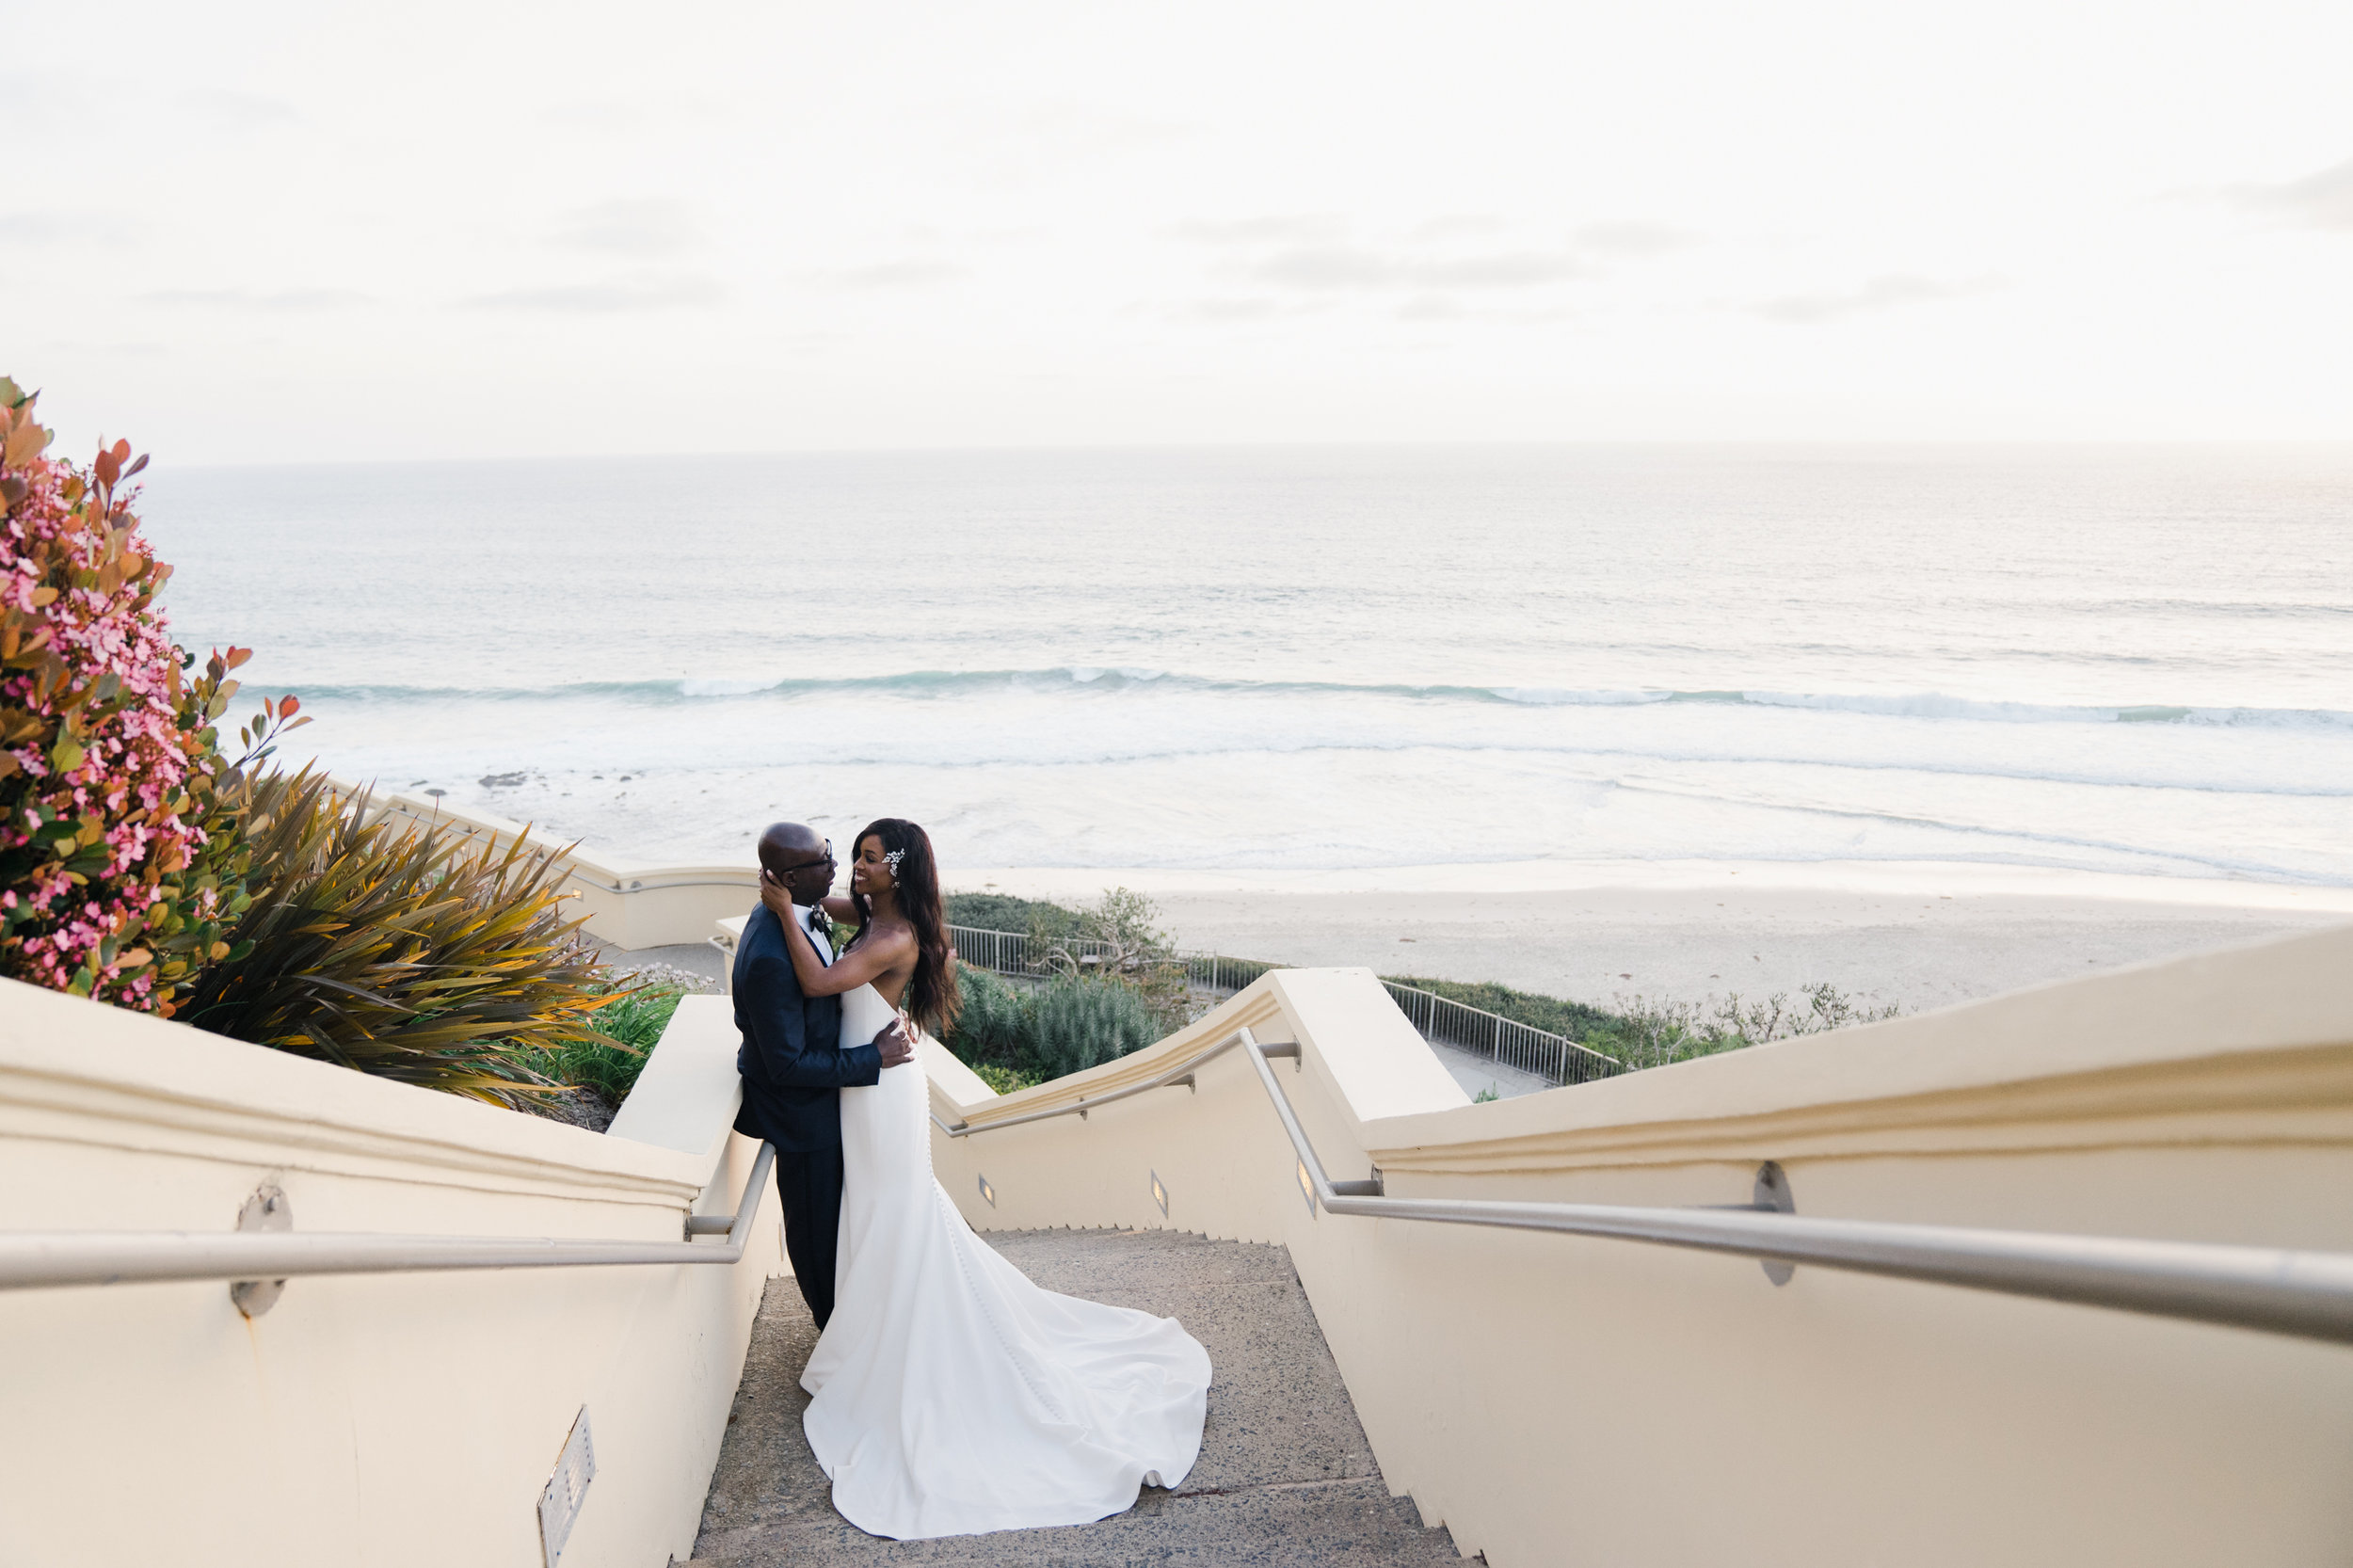 ritz-carlton-laguna-niguel-wedding-sonya_0191.JPG